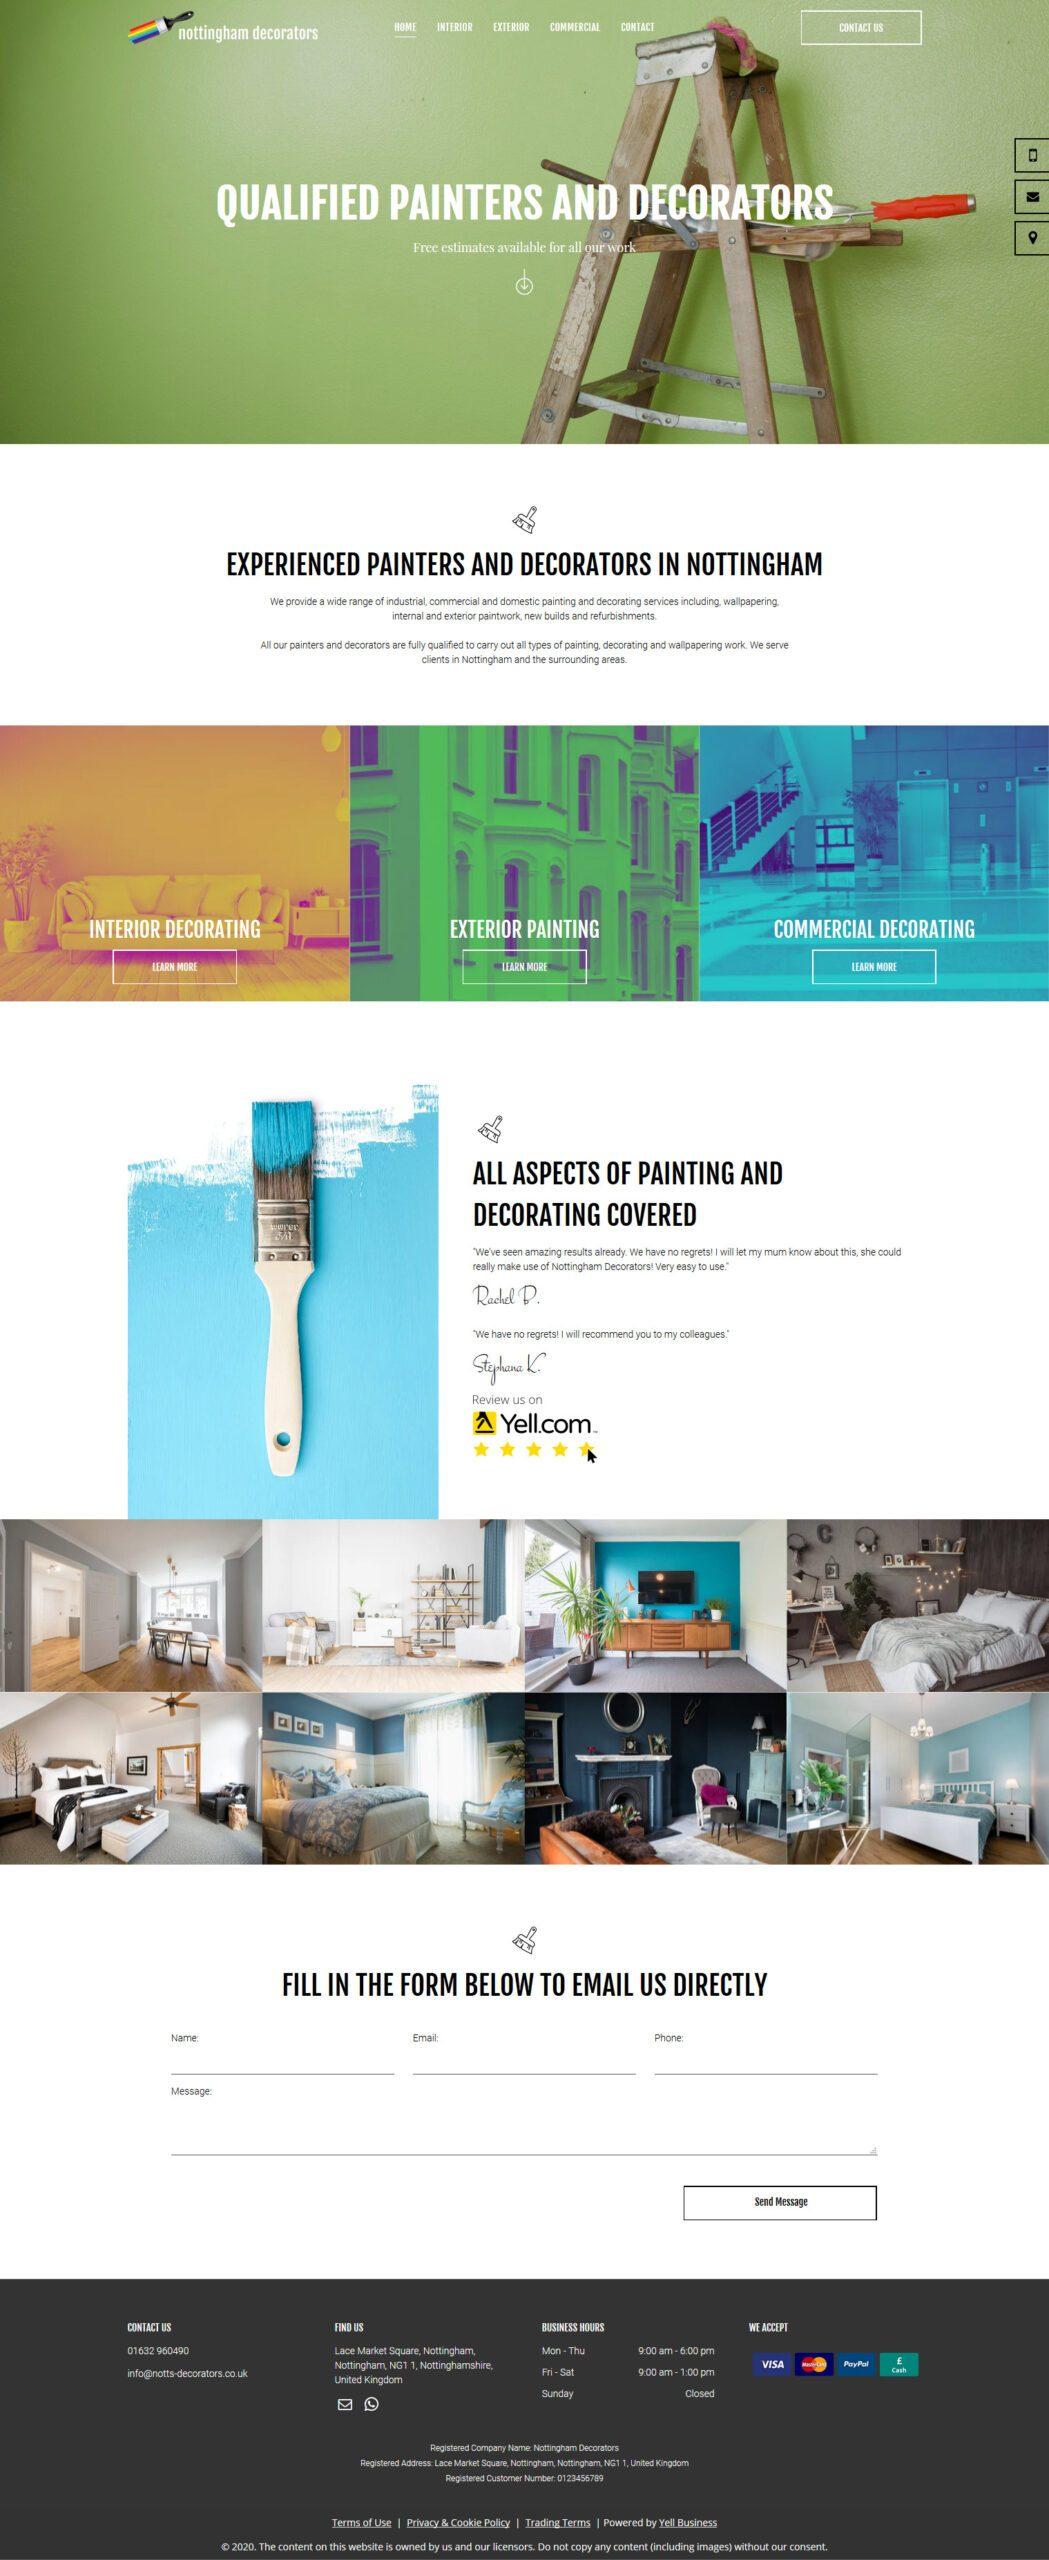 nottingham-decorators standard website